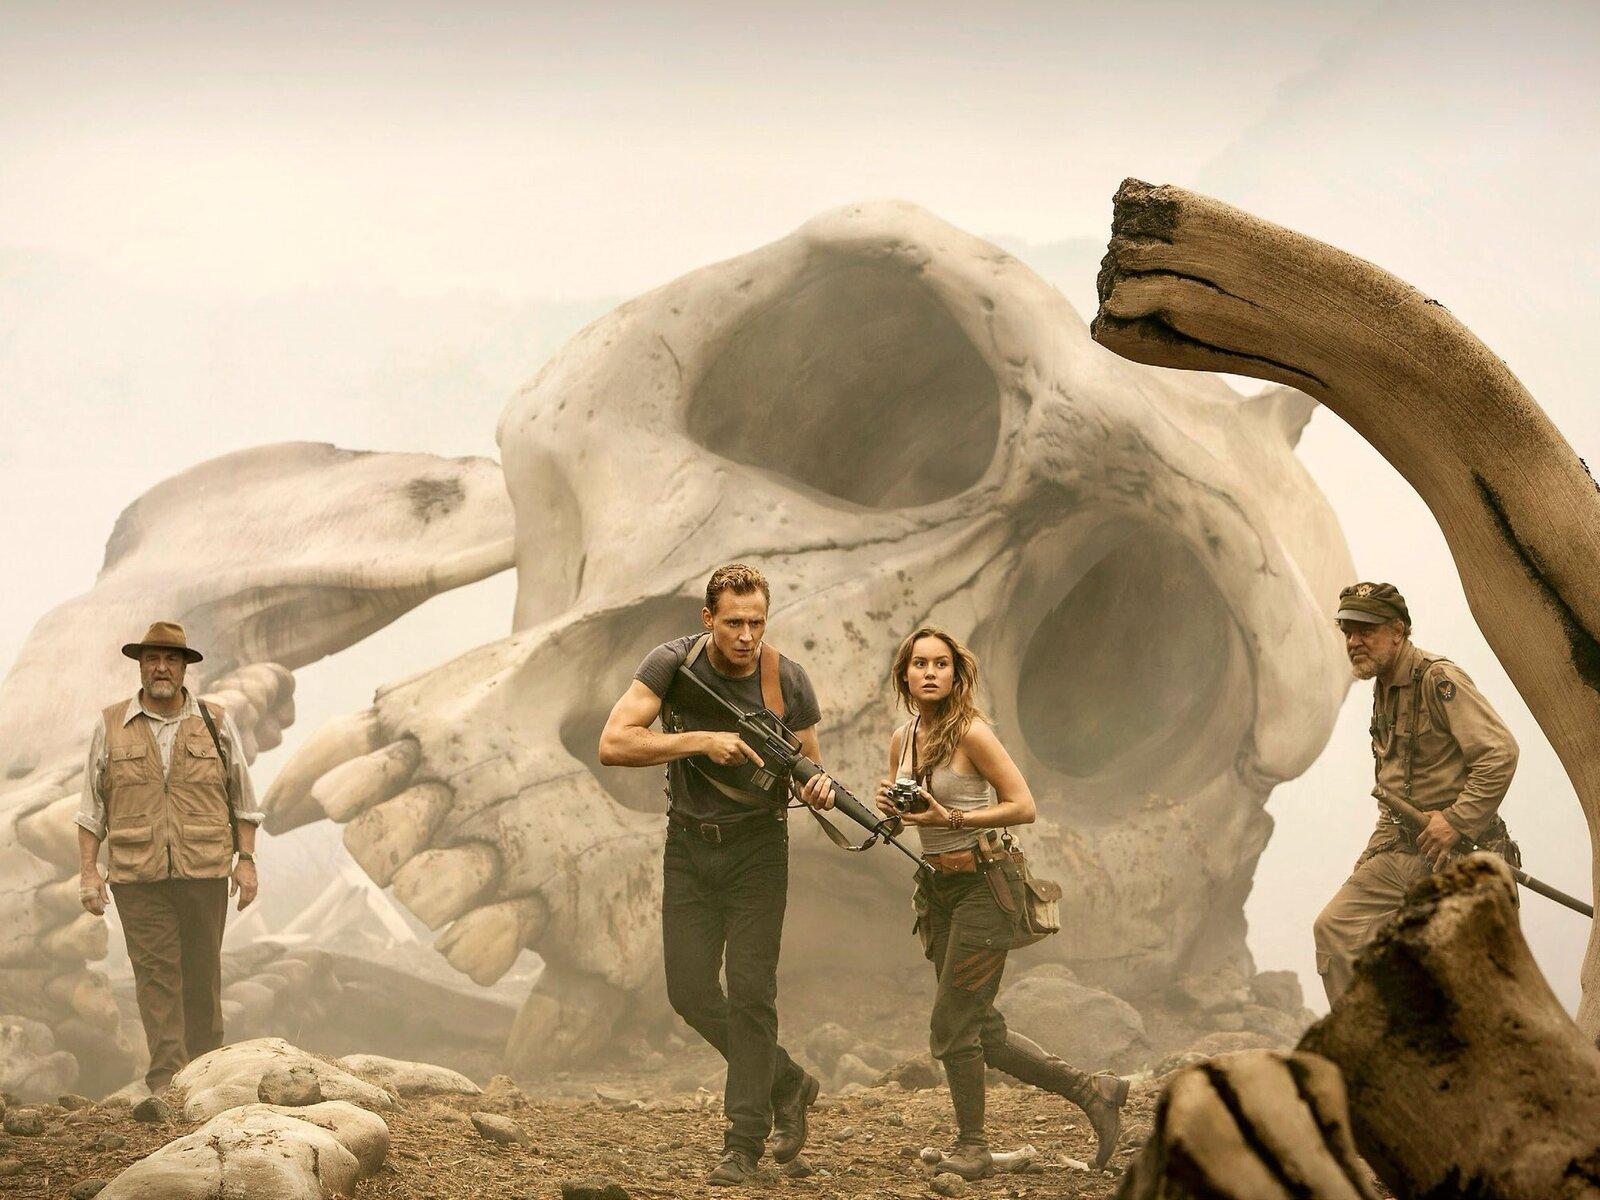 kong-skull-island-tom-hiddleston-pic.jpg